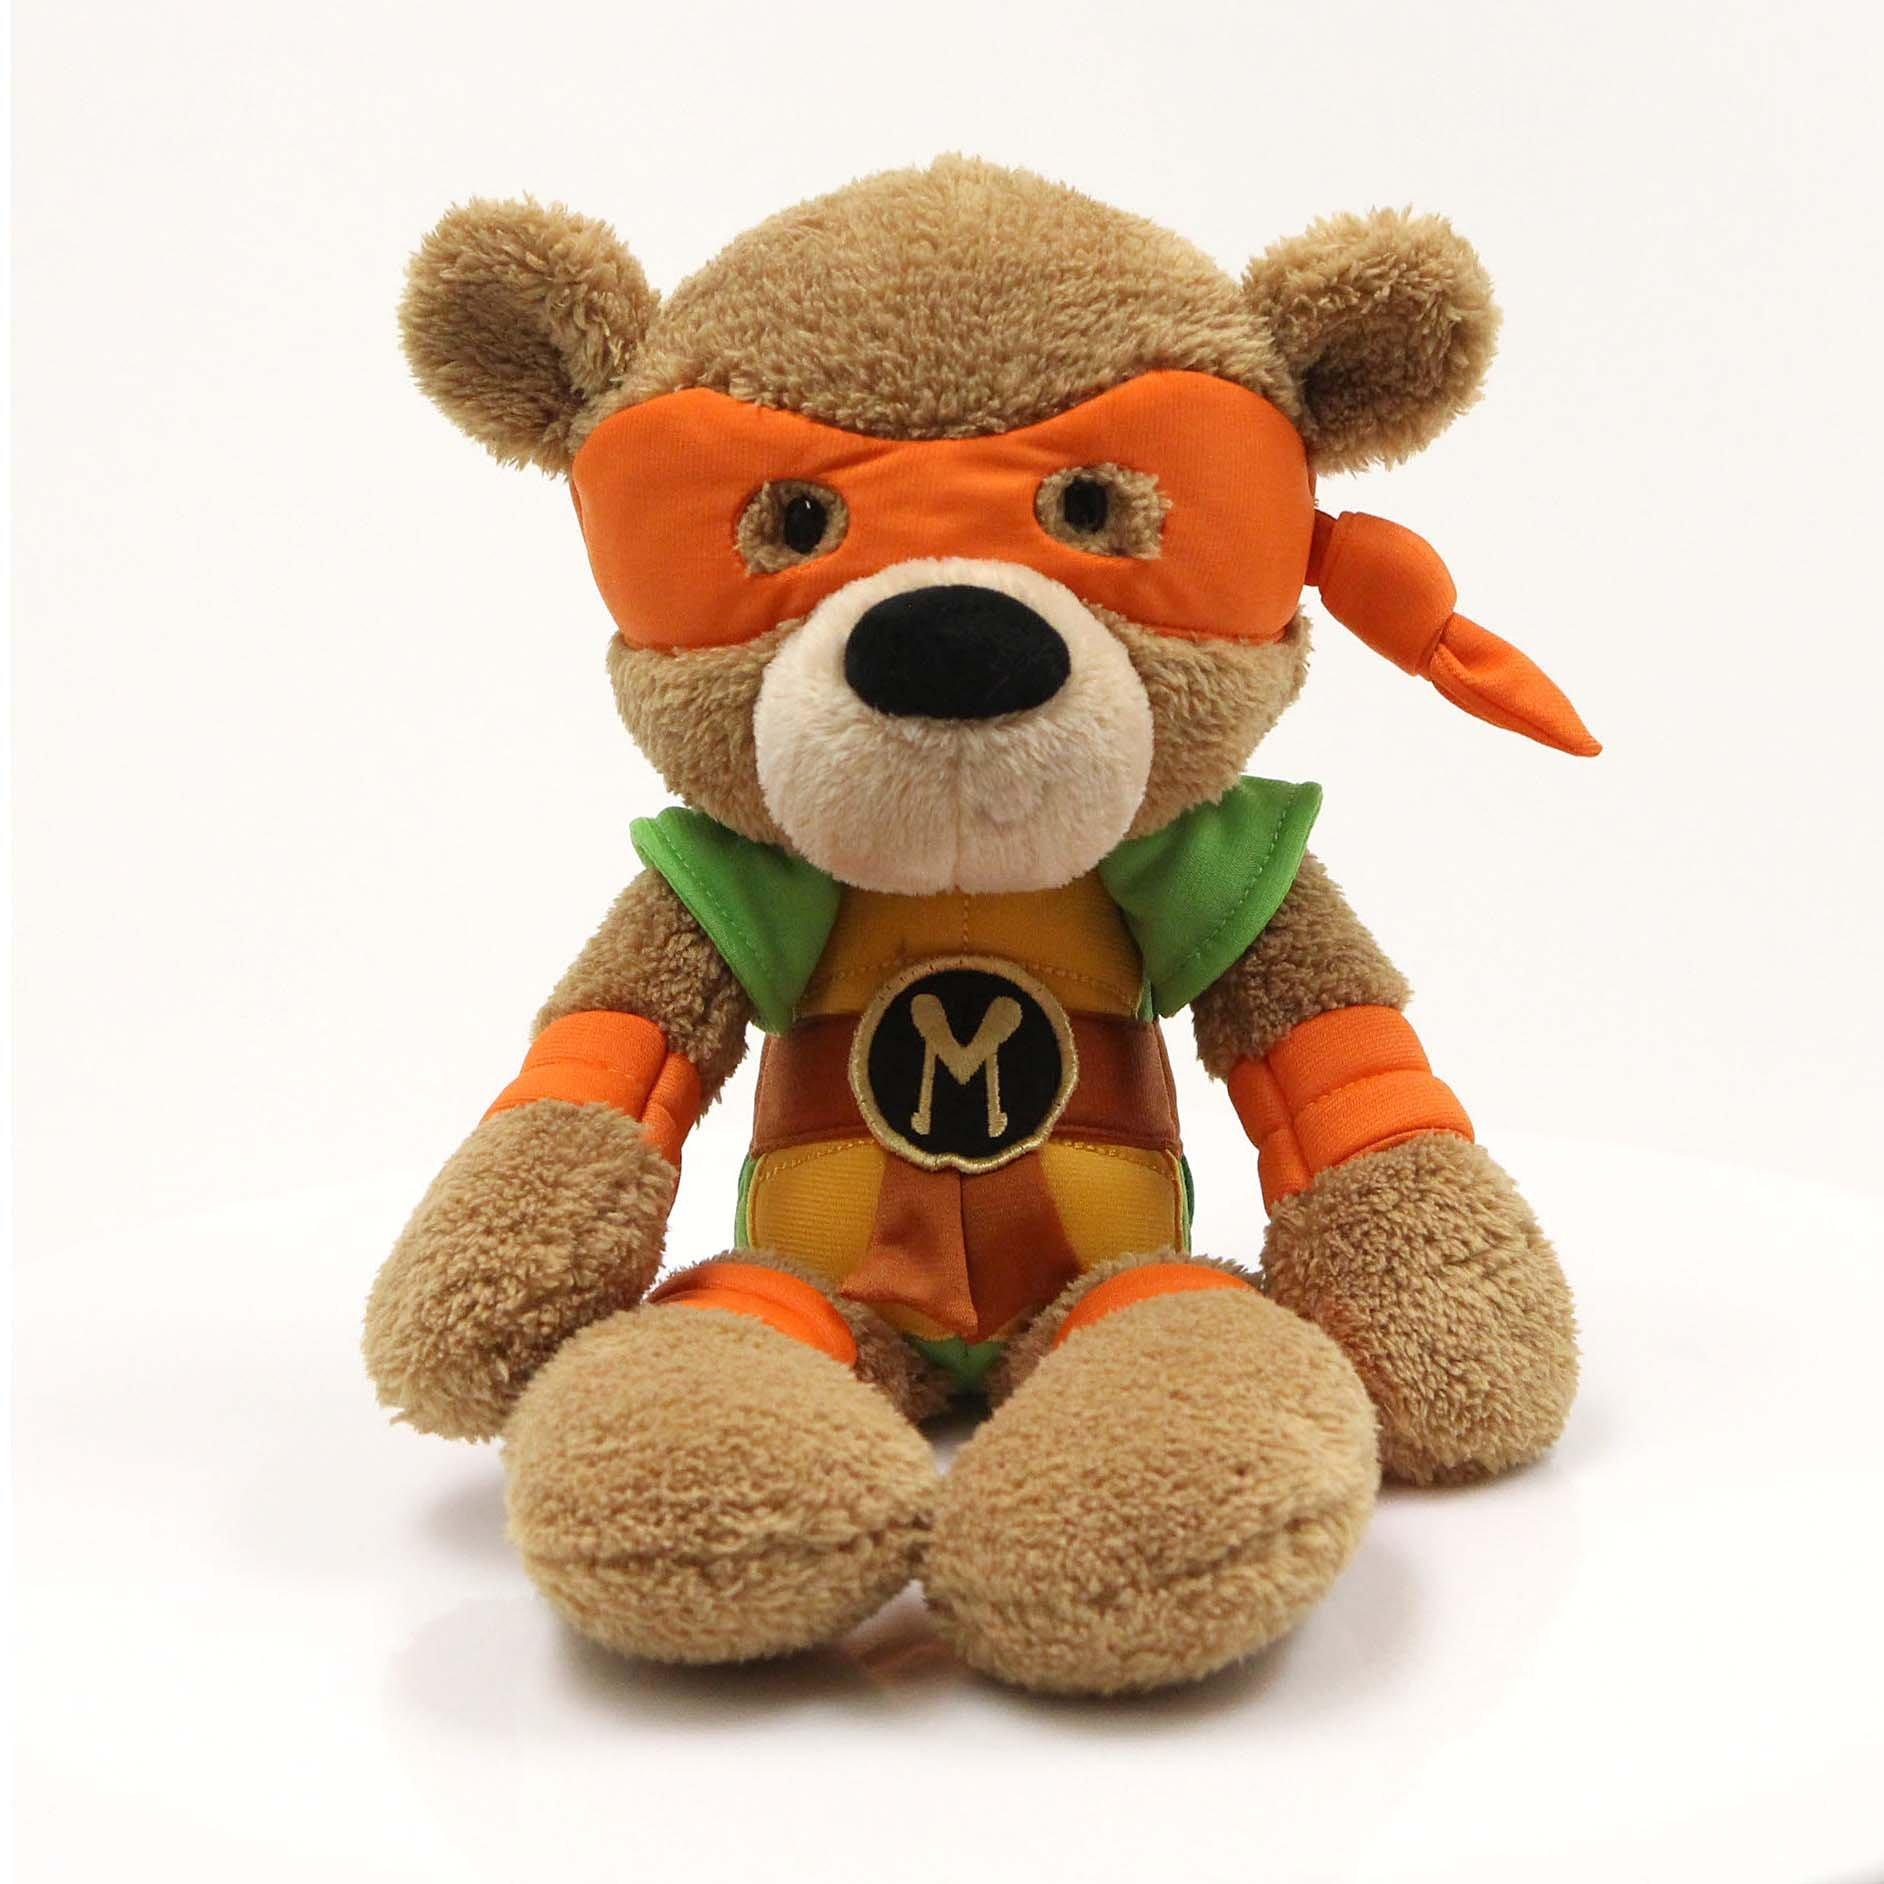 Michaelangelo Fuzzy Bear 12: Amazon.es: Gund: Libros